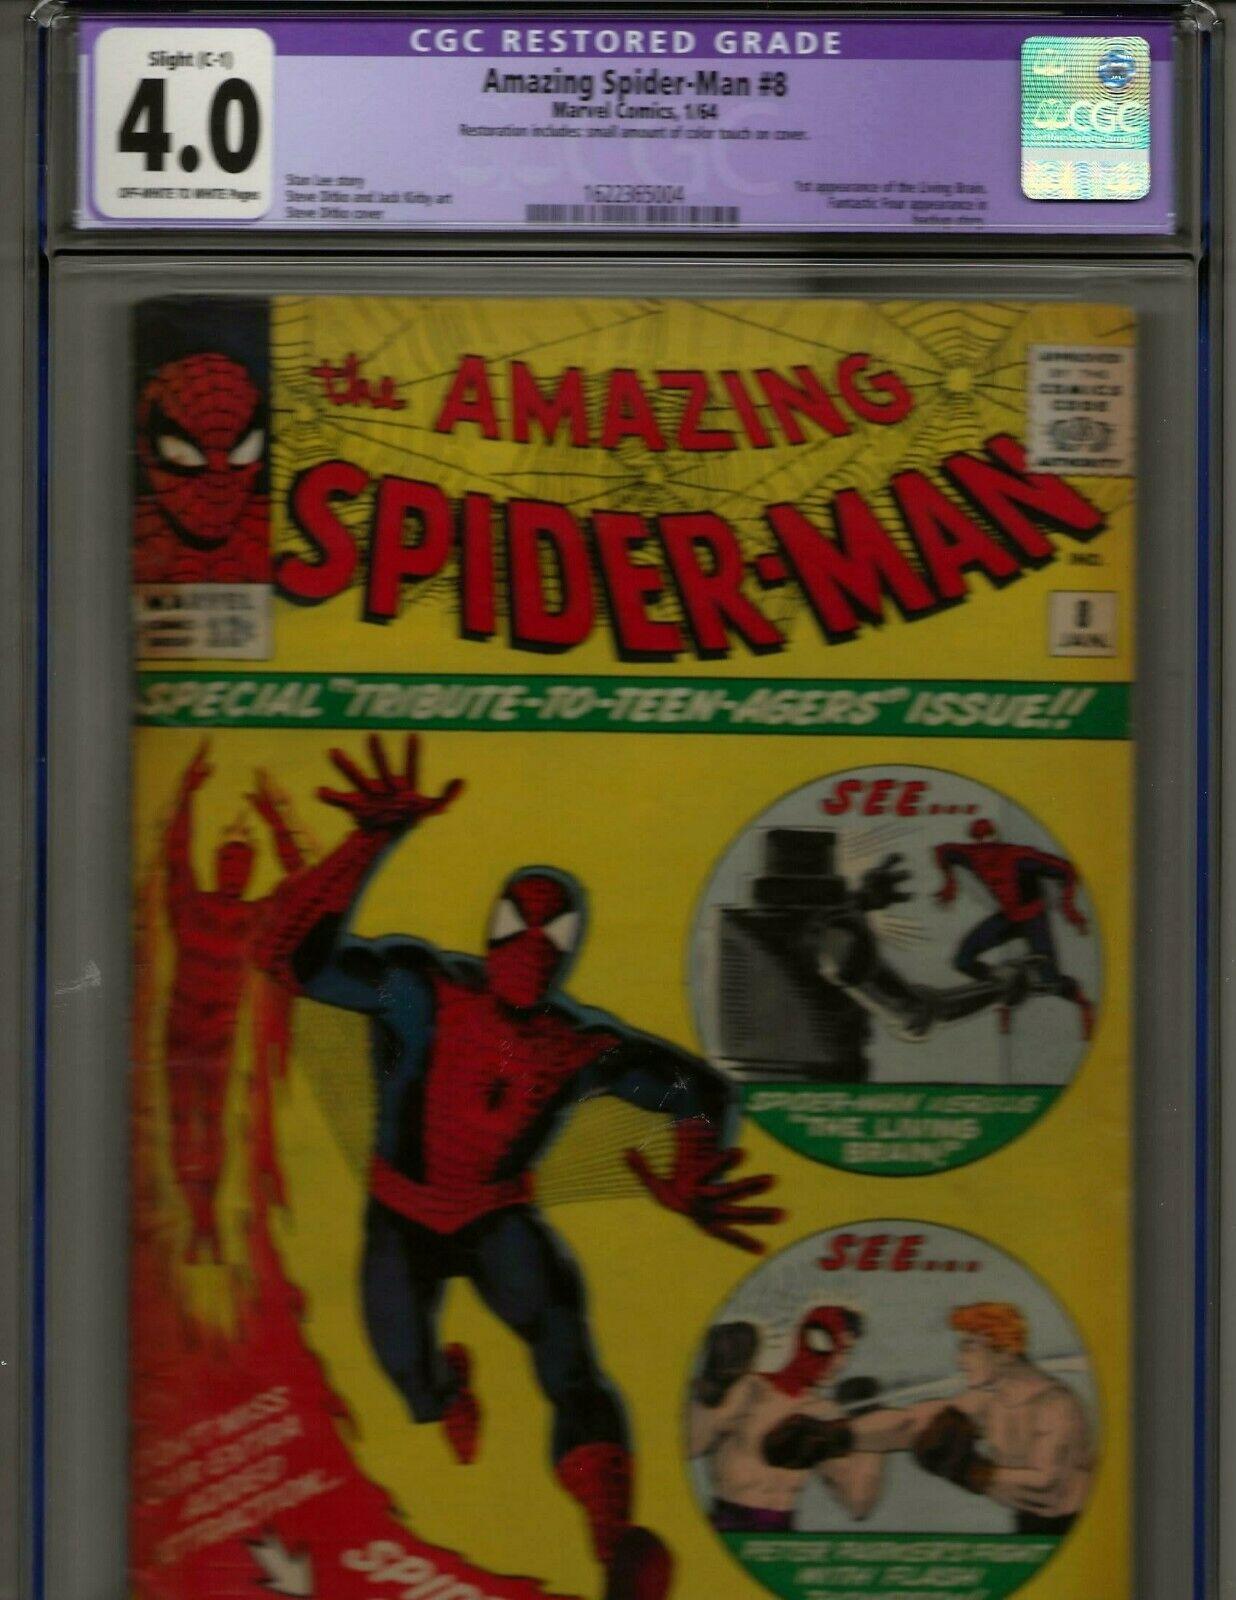 AMAZING SPIDER-MAN #8 CGC 4.0 VG OW/W Slight C-1 Marvel 1/64 FANTASTIC FOUR